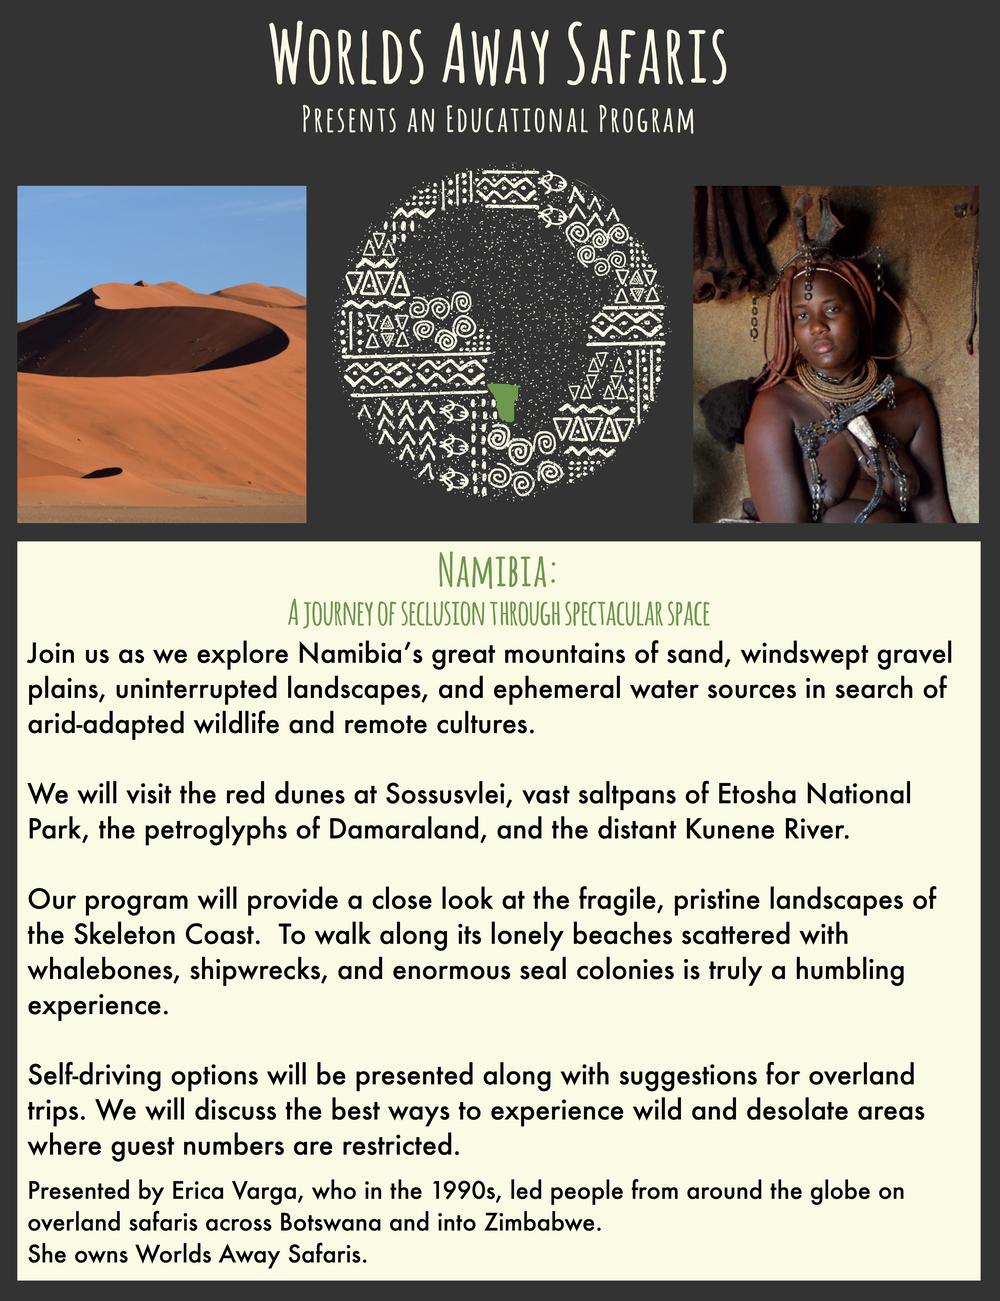 WAS_Namibia_Program Description.jpg